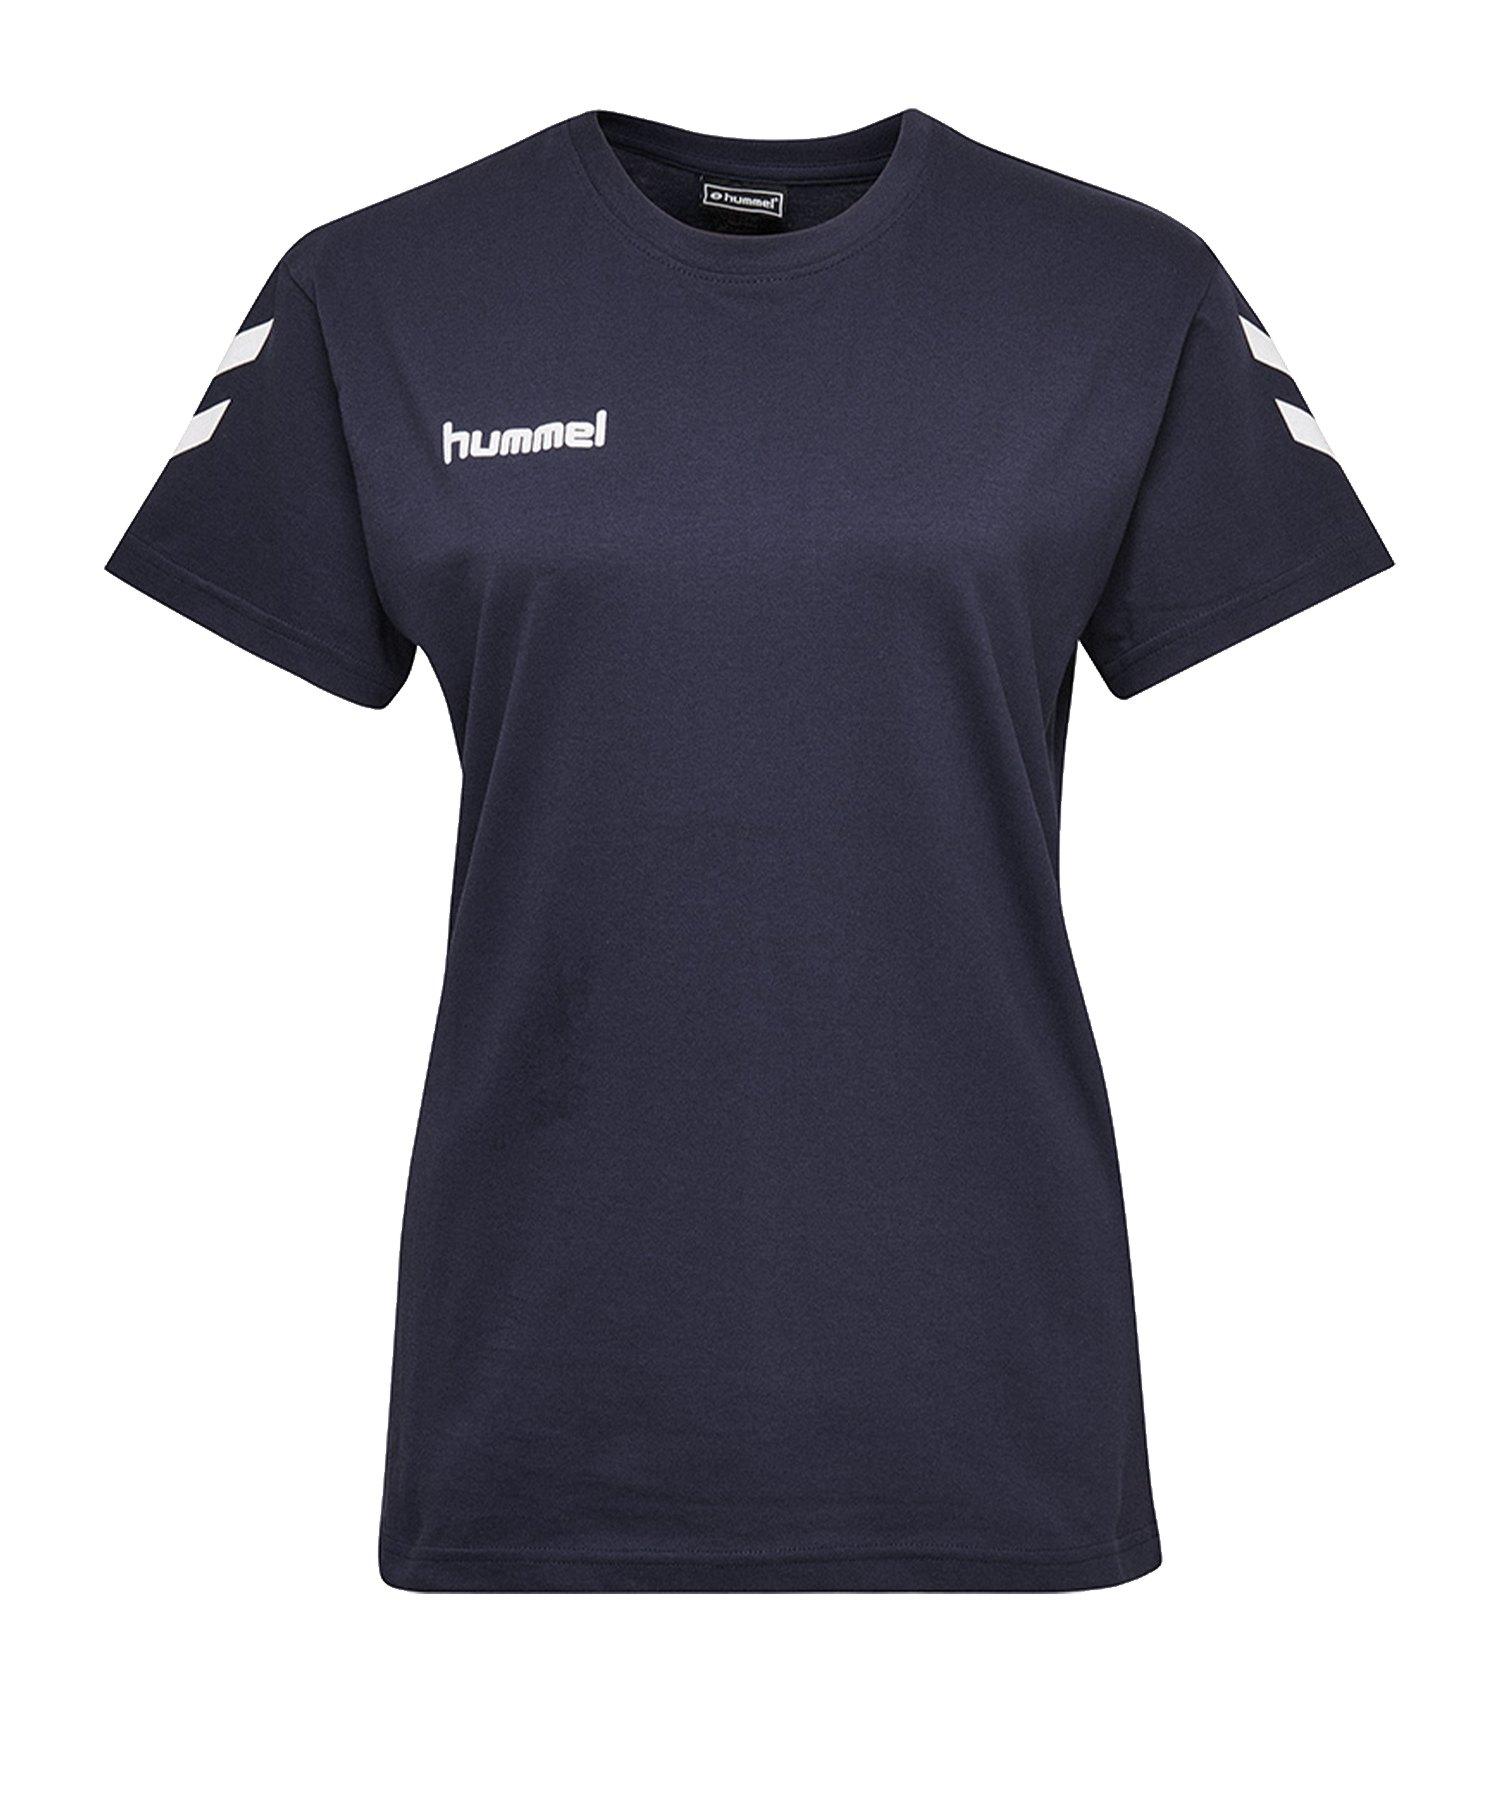 Hummel Cotton T-Shirt Damen Blau F7026 - Blau